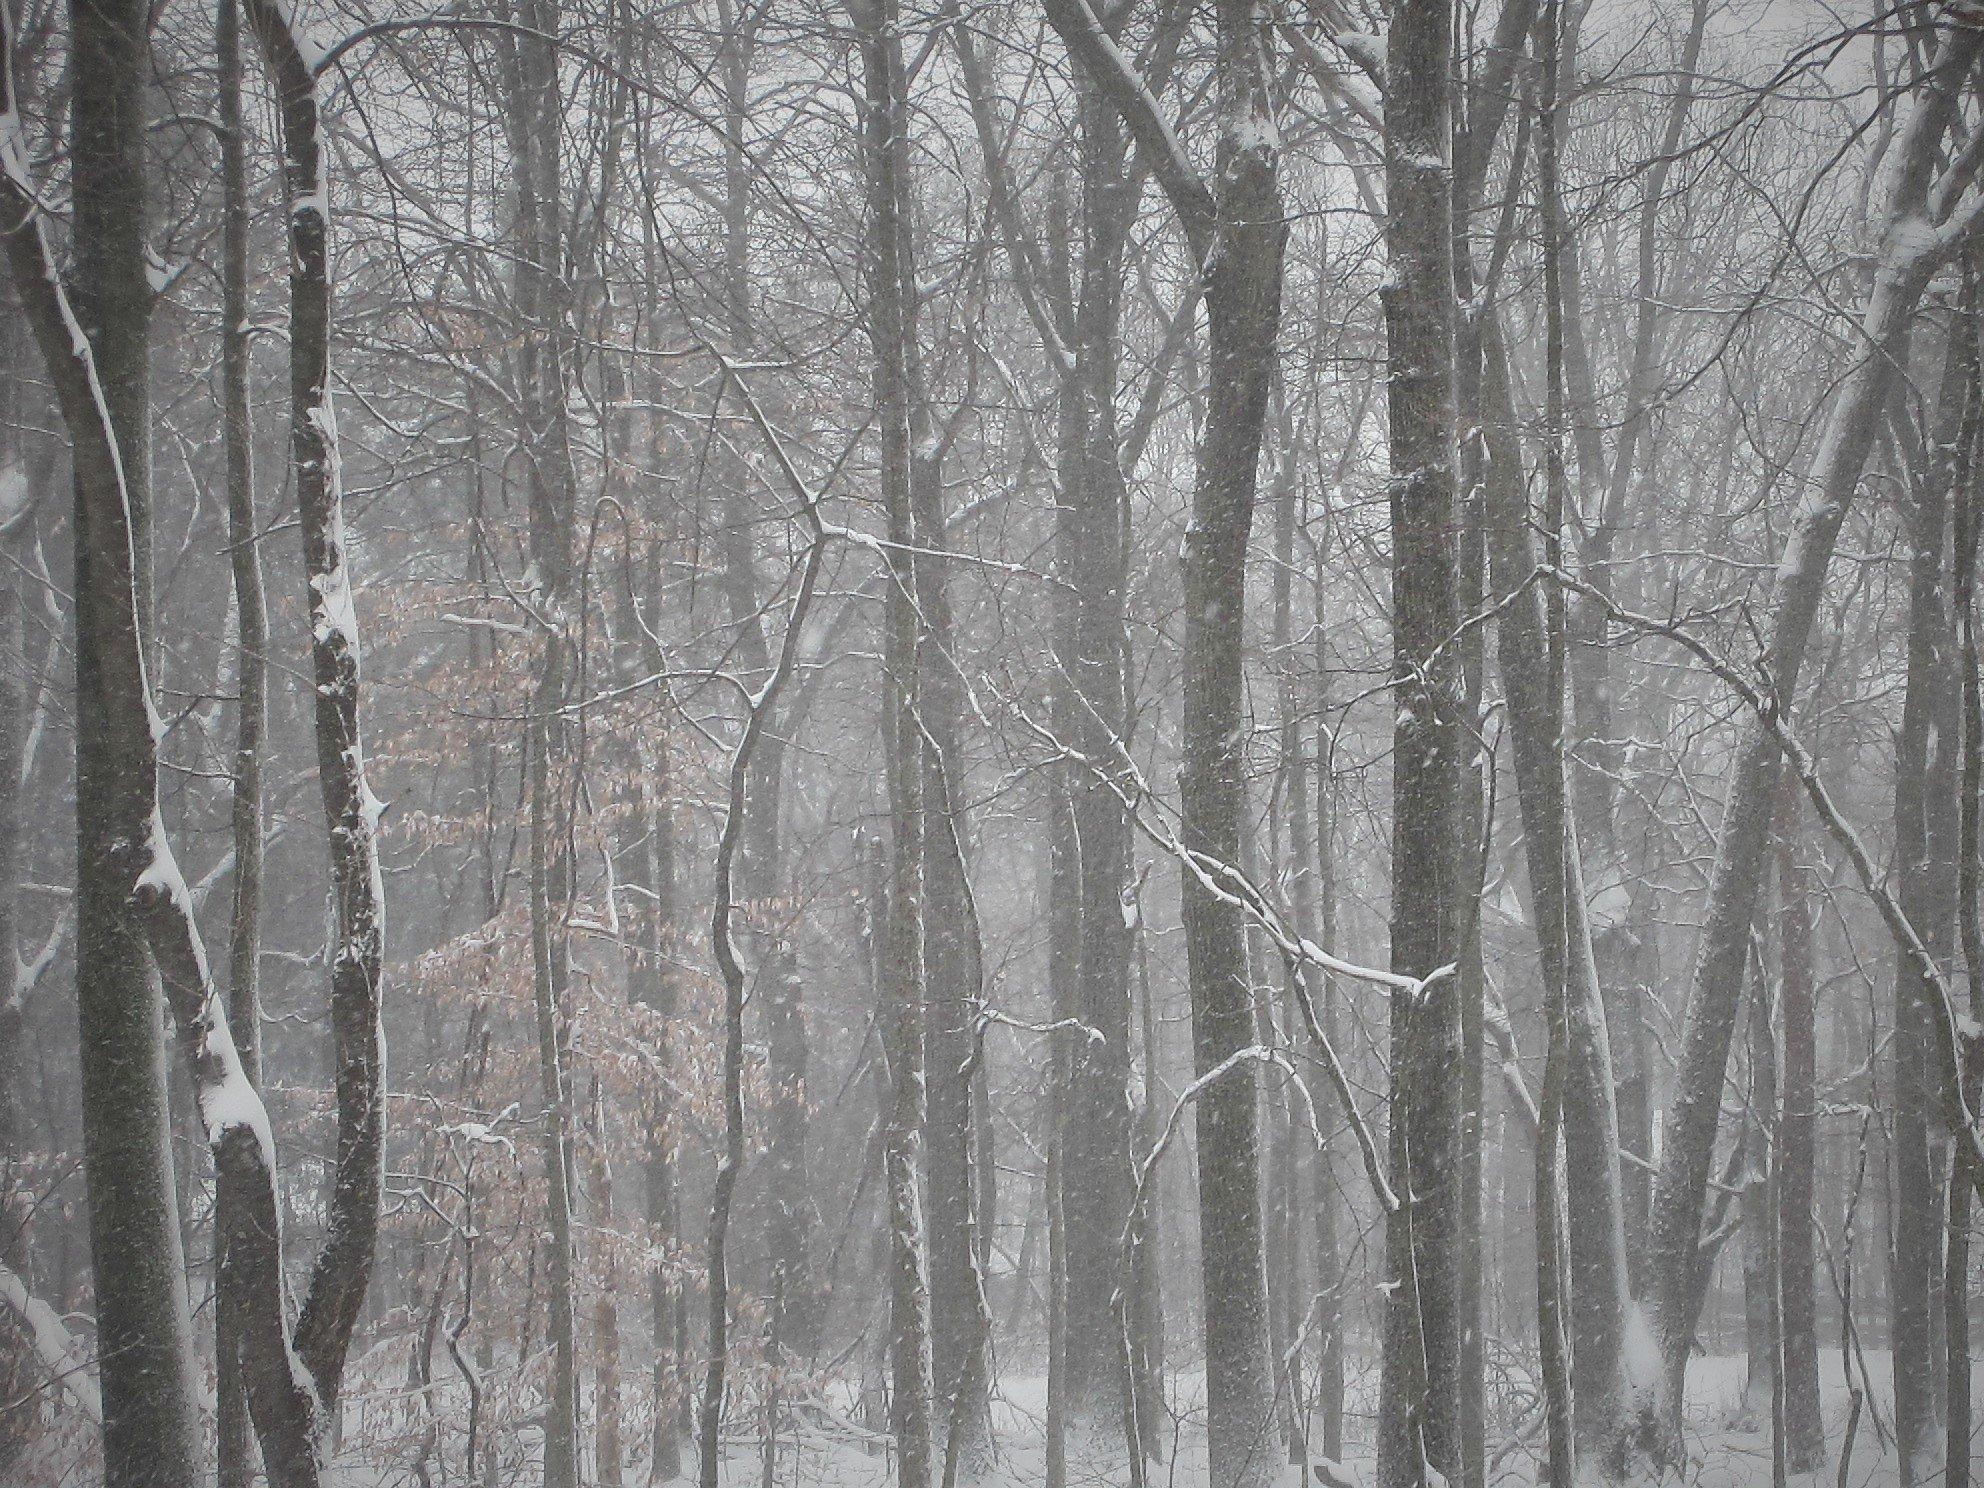 winter snow 09Feb2017 – trees 3